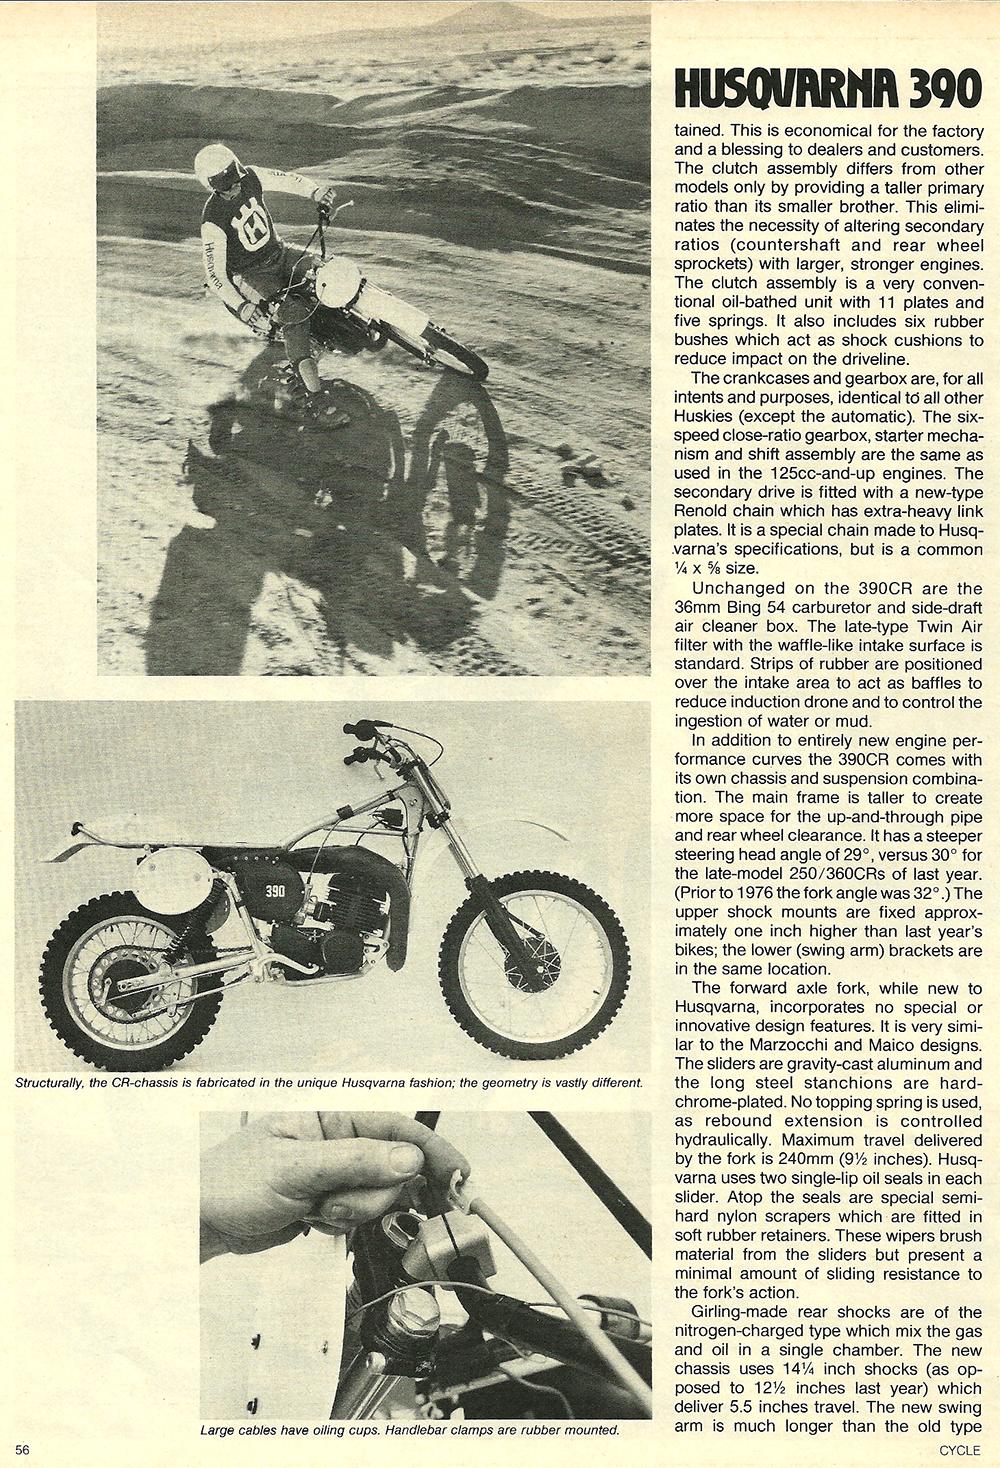 1977 Husqvarna 390 CR road test 3.jpg